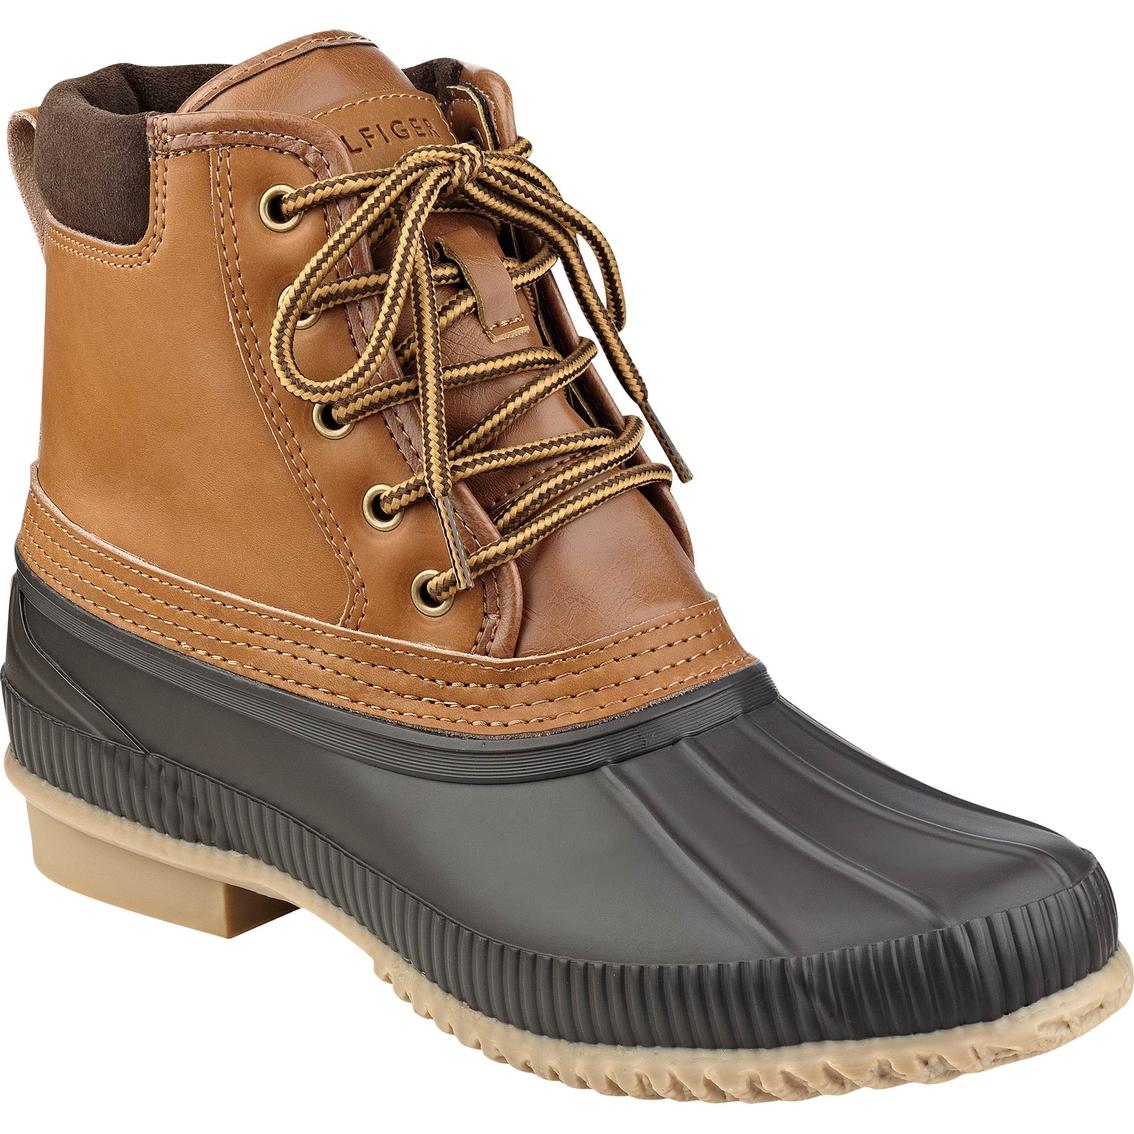 97c6aa77e80e45 Tommy Hilfiger 5 Eye Duck Boots